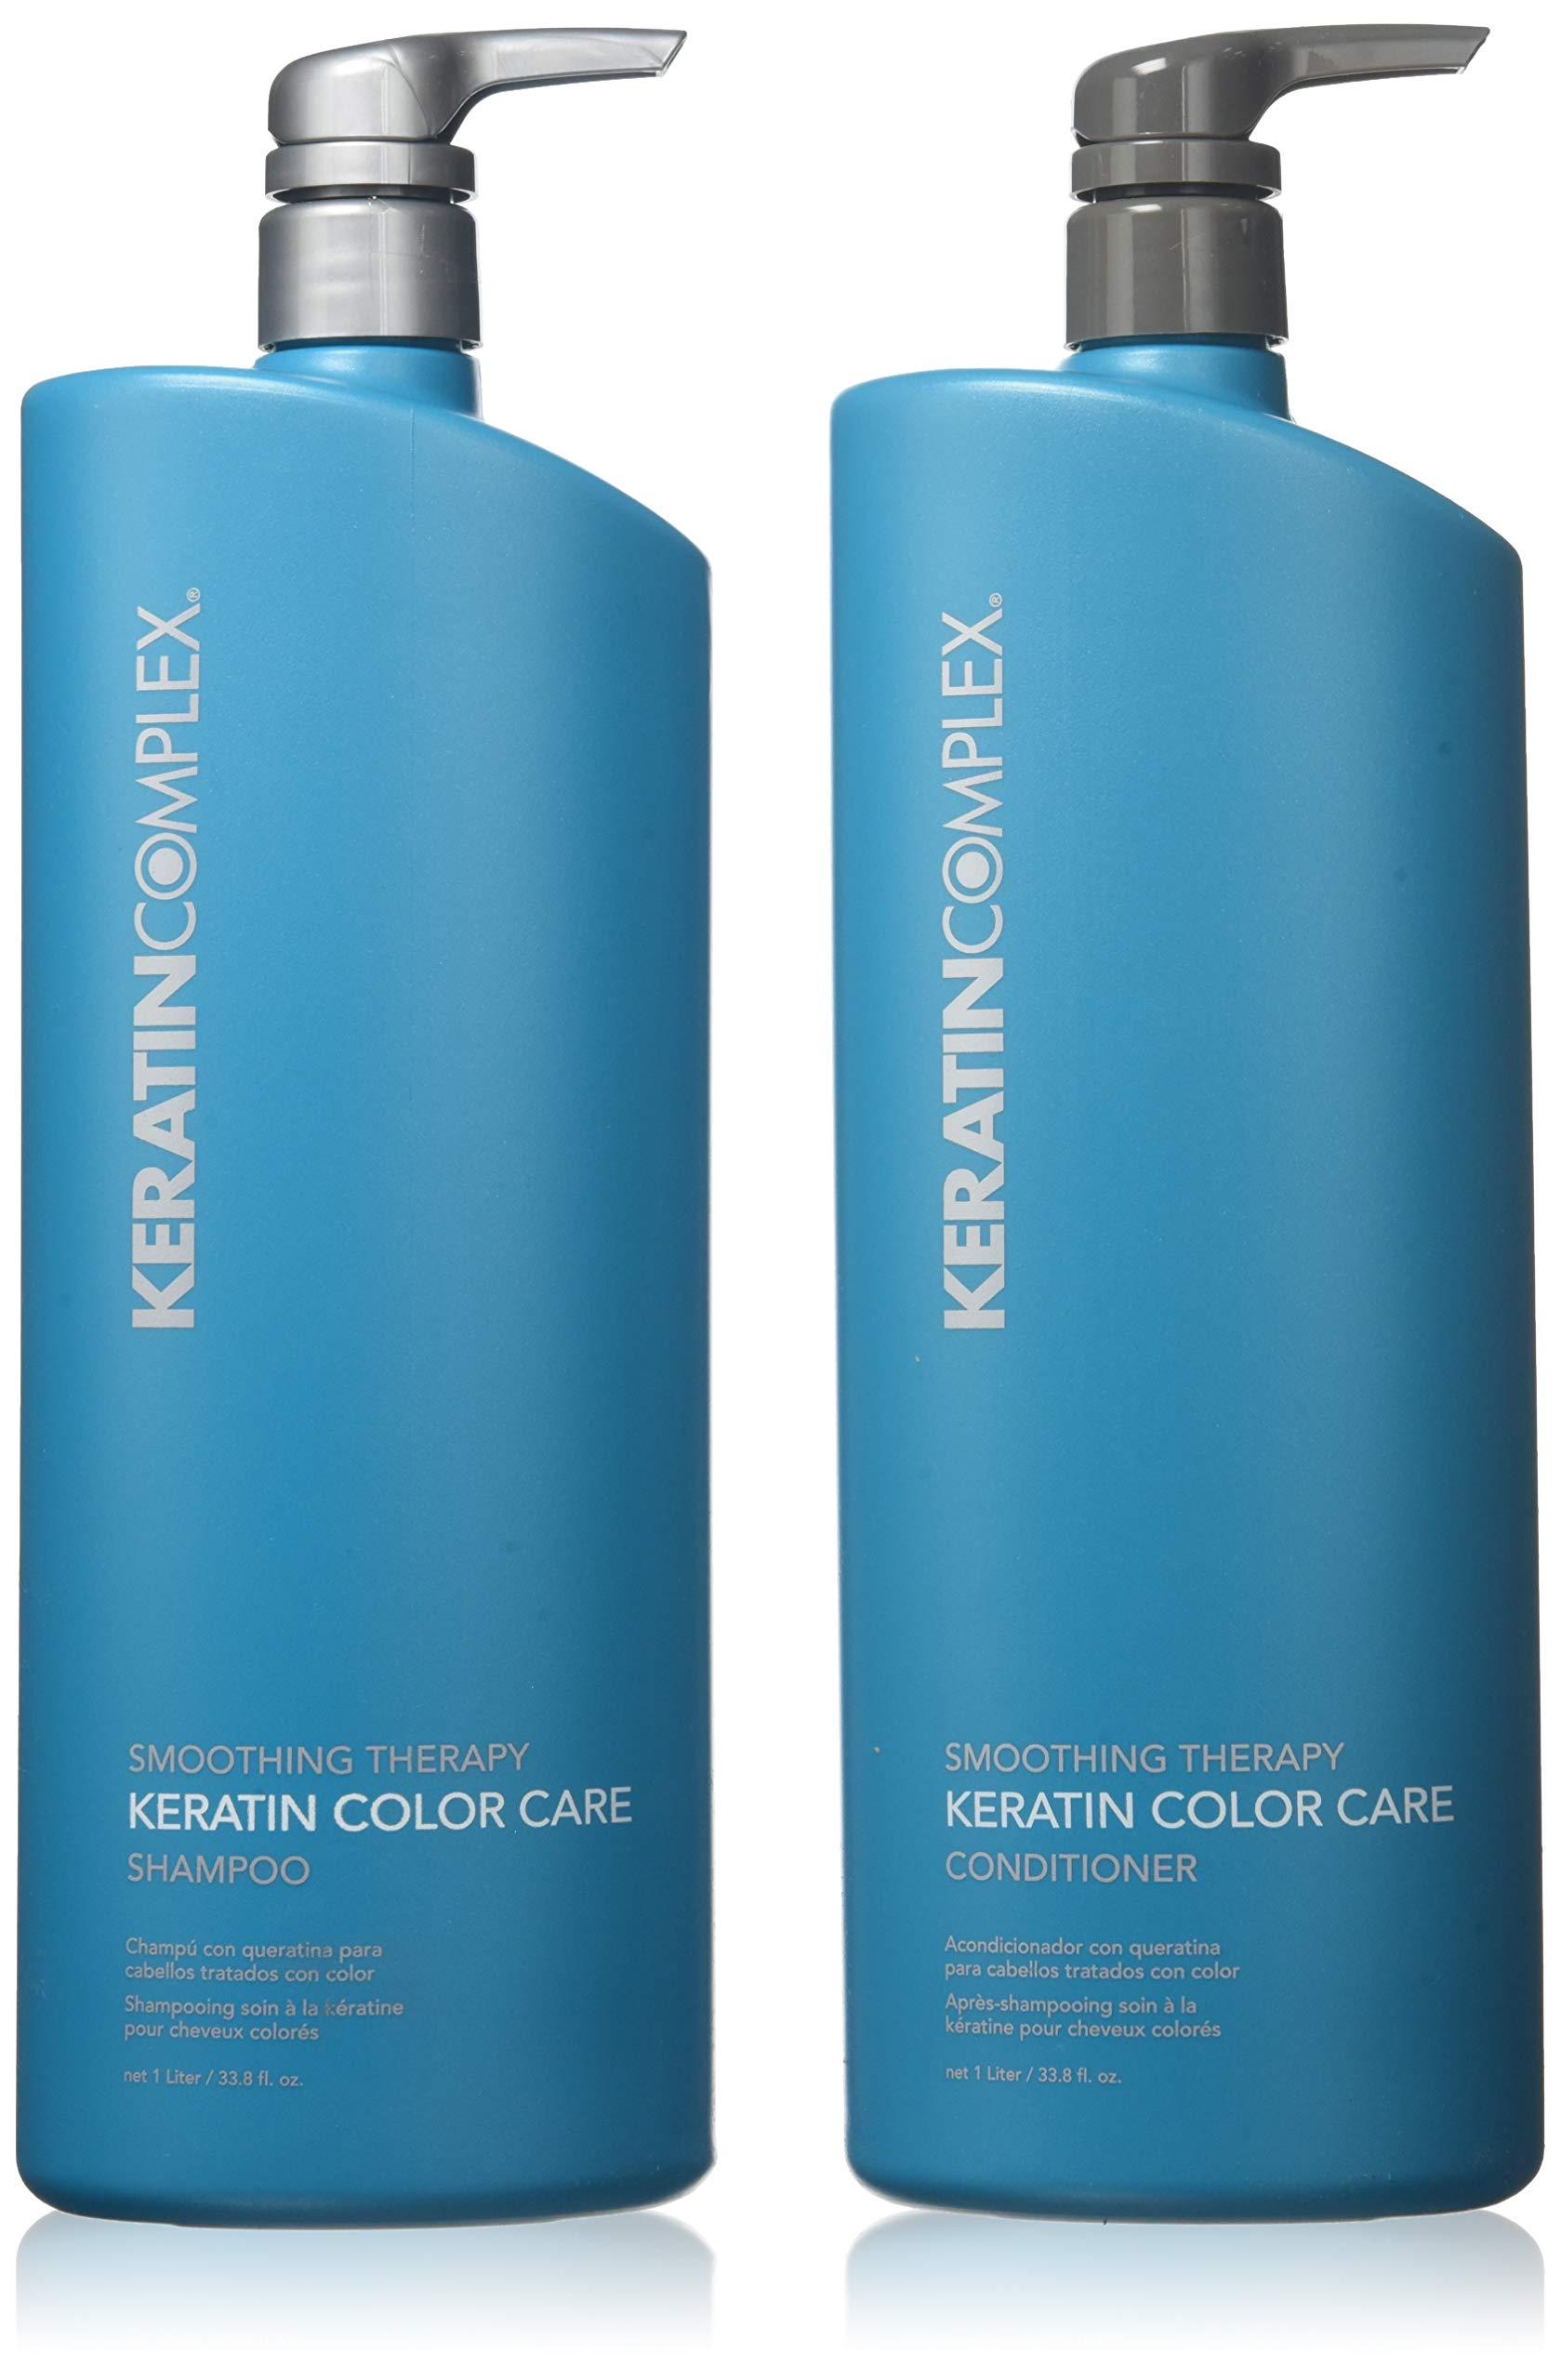 Keratin Complex Color Care Shampoo n Conditioner 33.8 Ounces Set by Keratin Complex